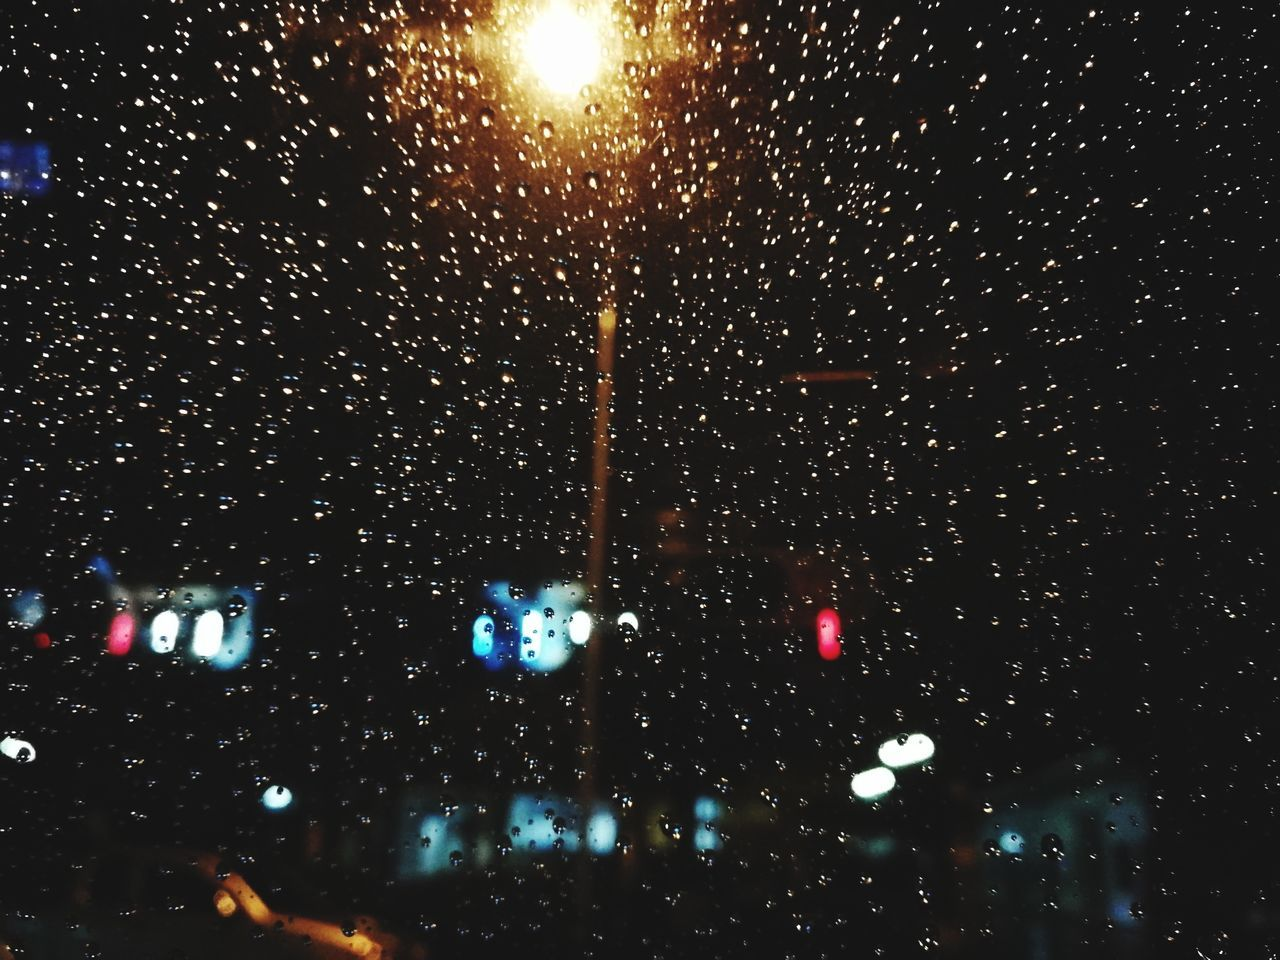 illuminated, night, glowing, no people, outdoors, close-up, sky, nature